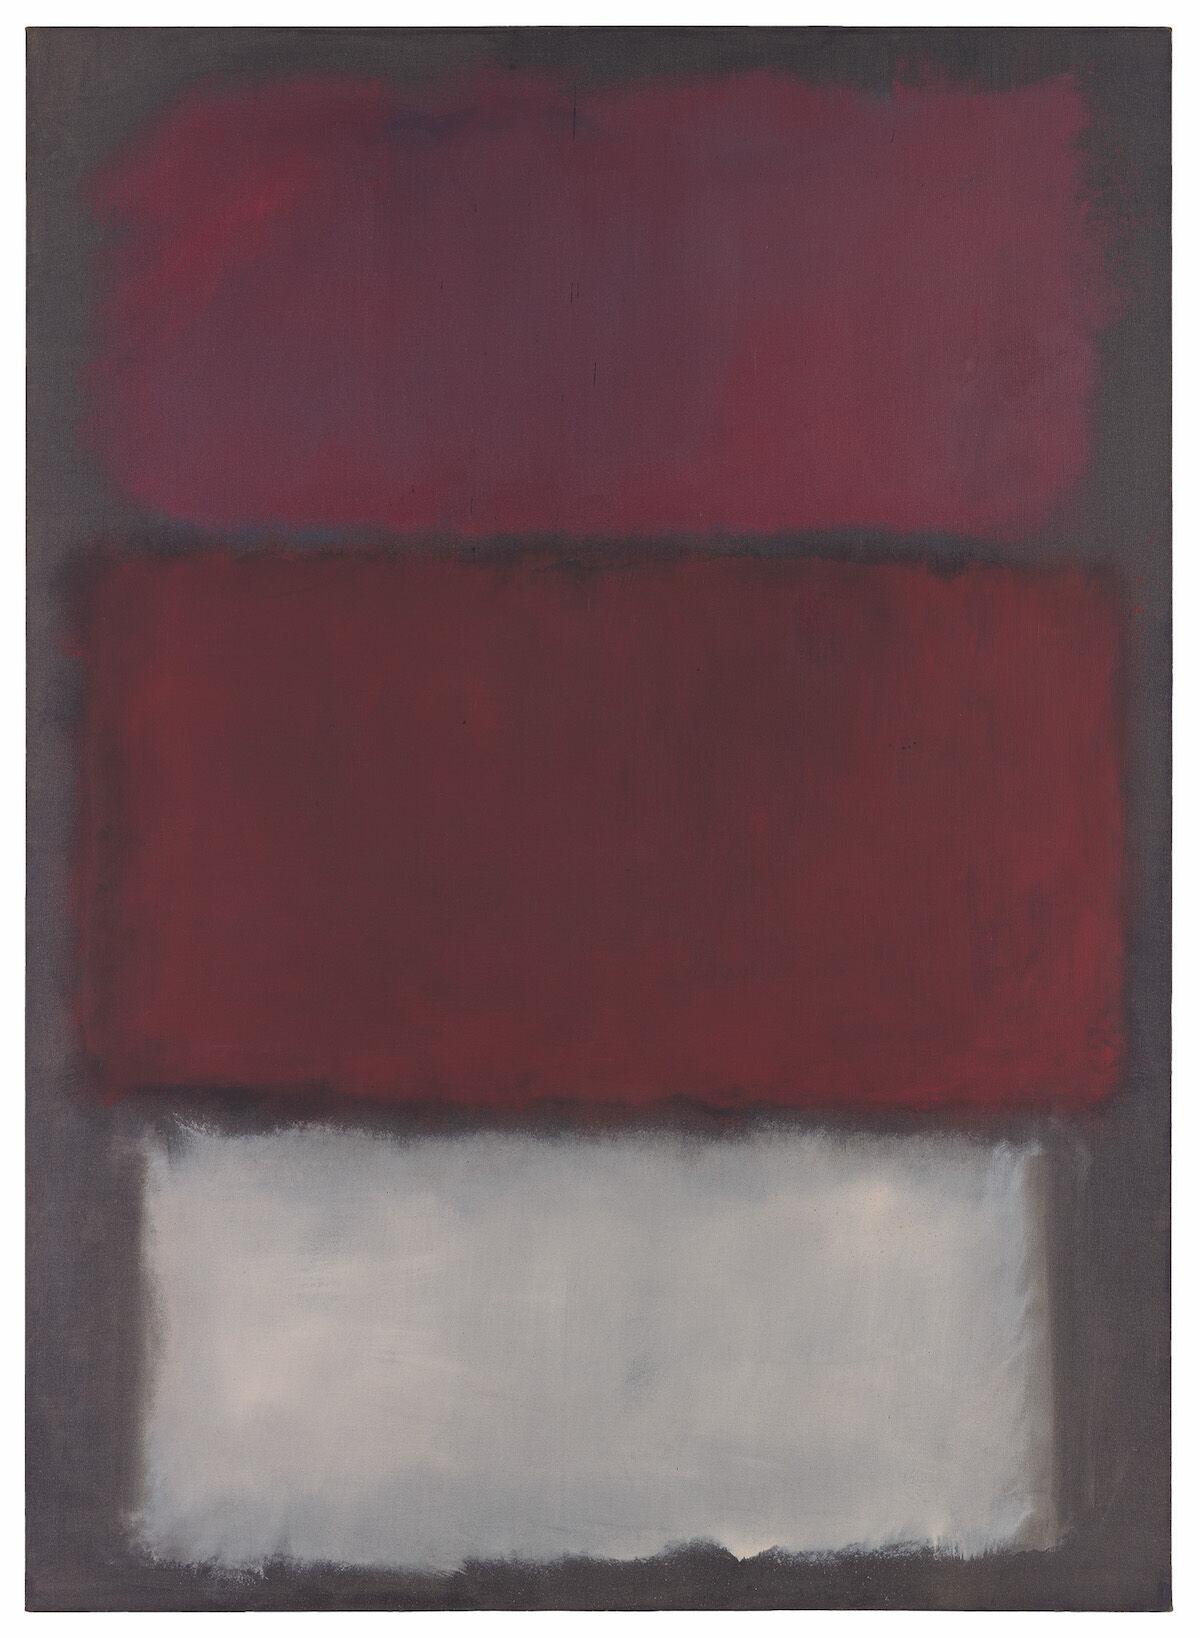 Mark Rothko, Untitled, 1960, oil on canvas. Est. $35 million–50 million. © 1998 Kate Rothko Prizel and Christopher Rothko / Artists Rights Society (ARS), New York.